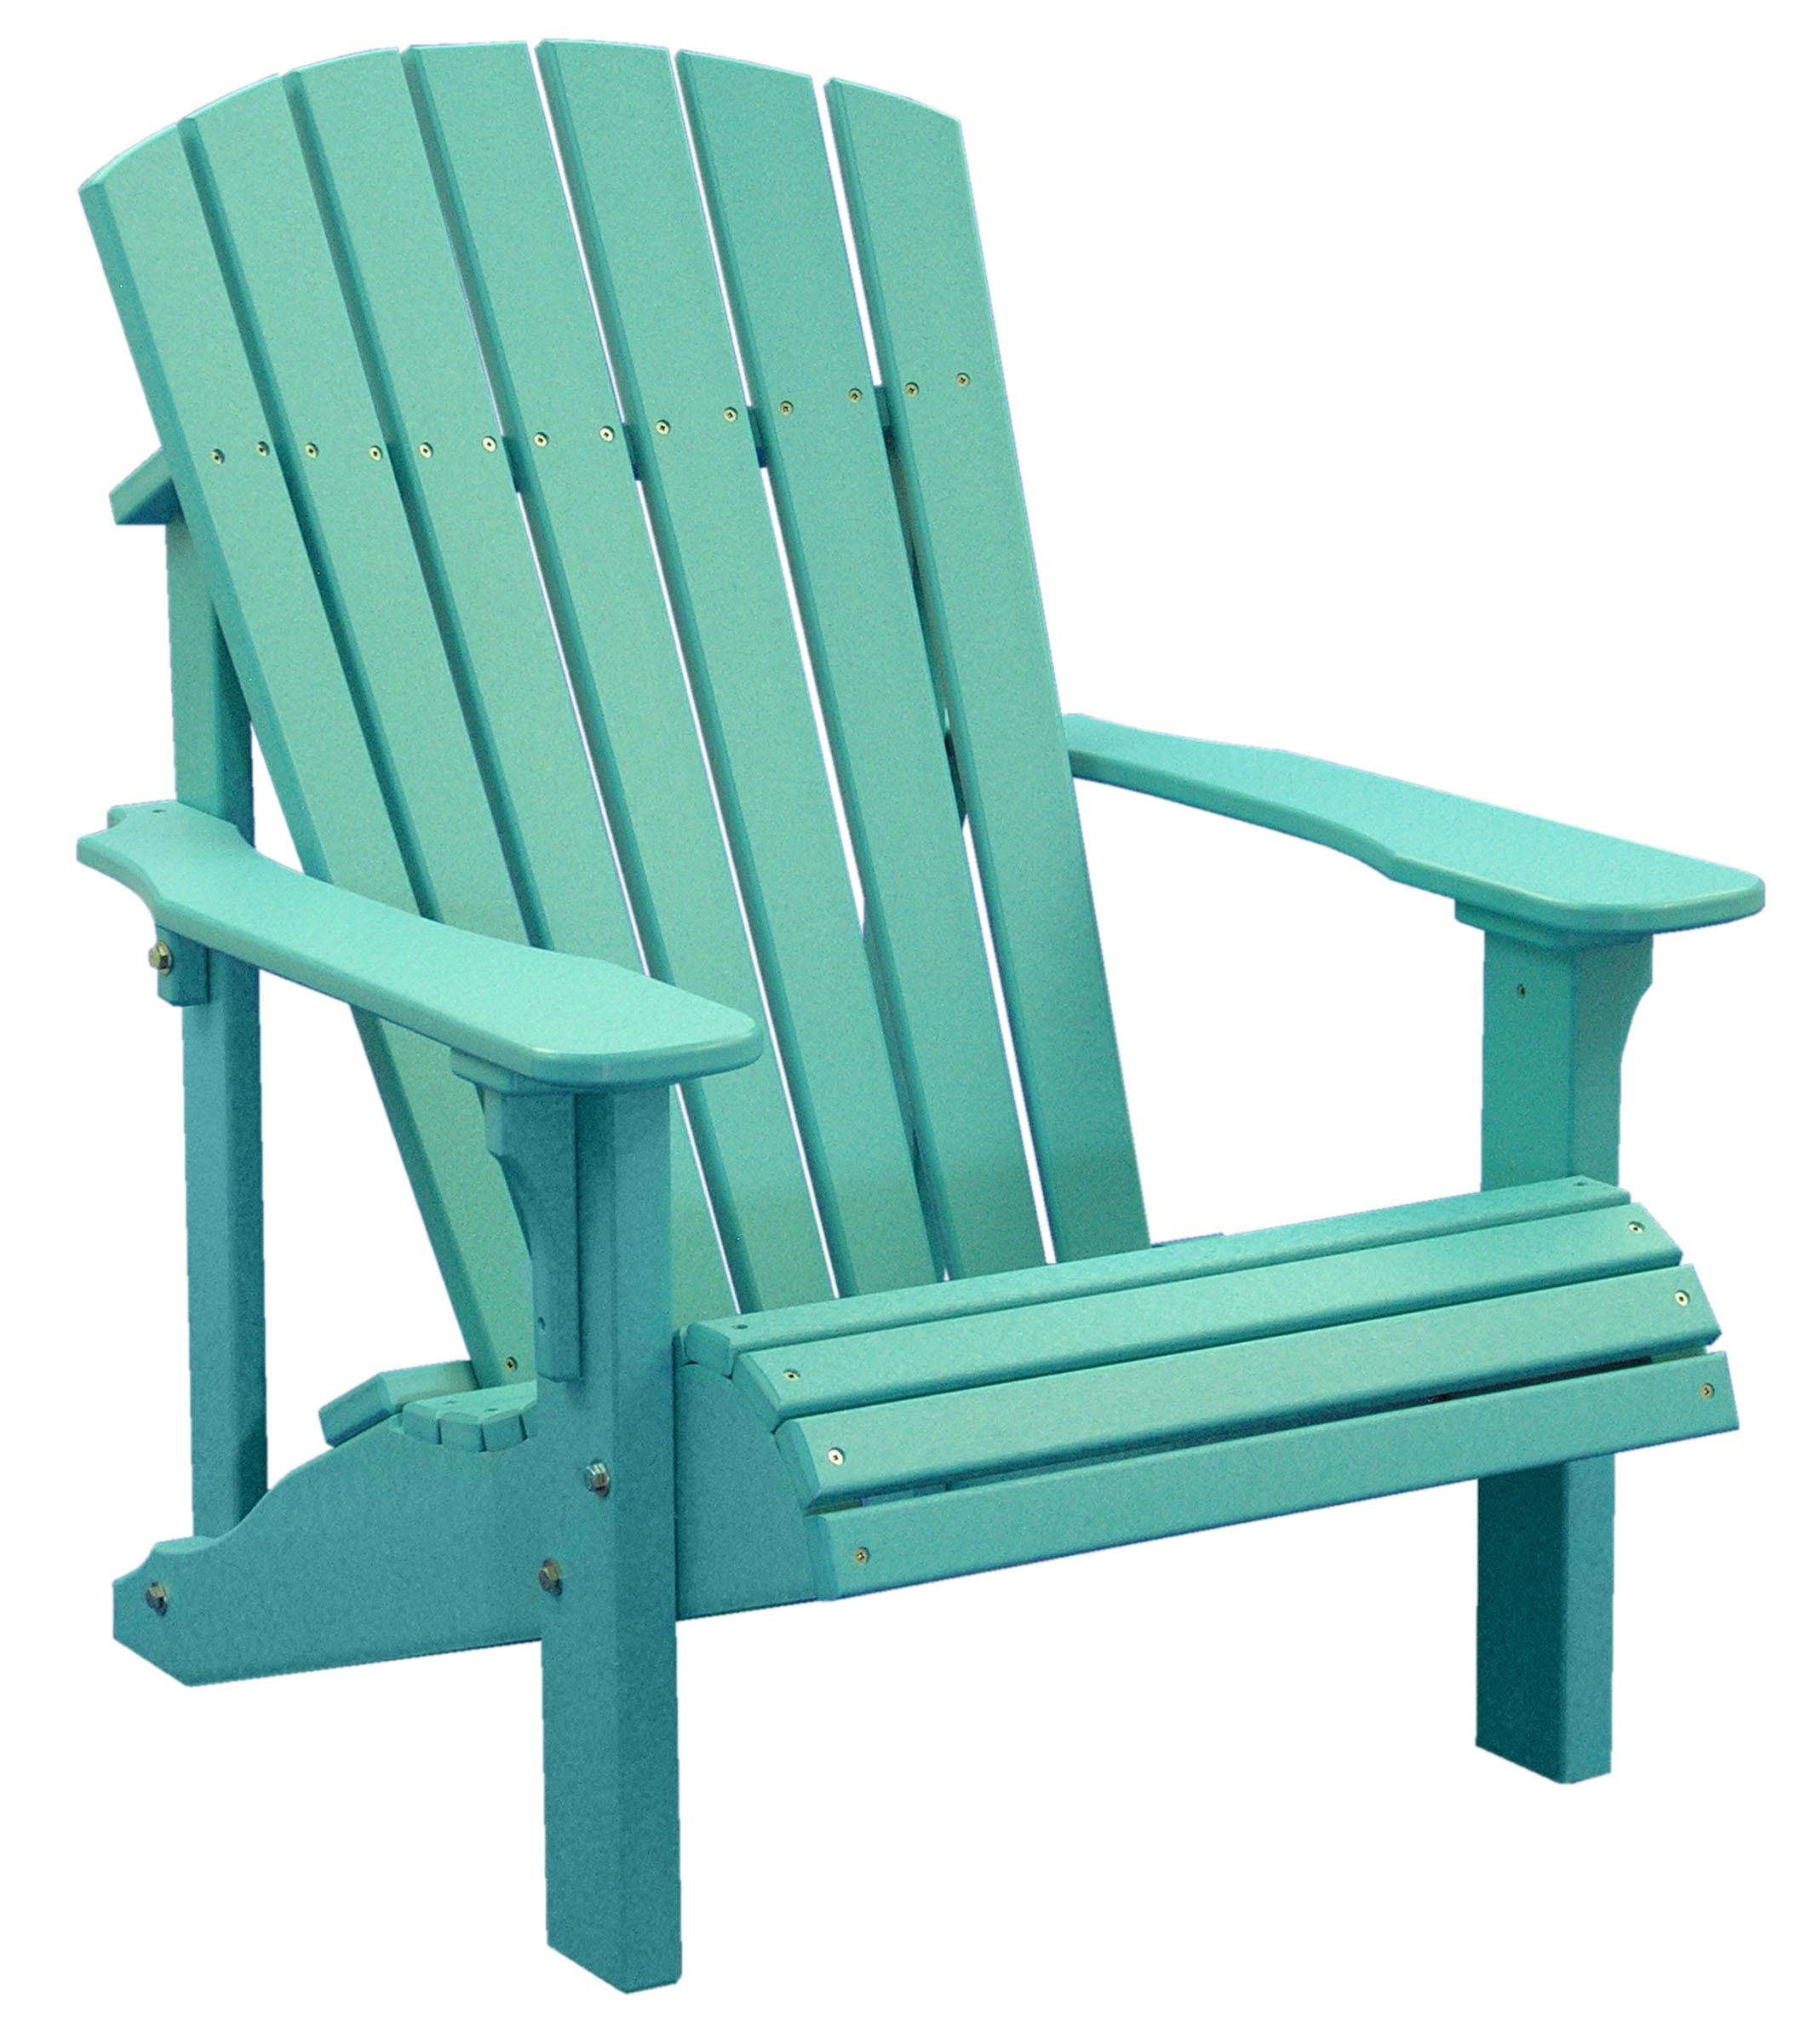 Chair clipart deck chair. Chairs amish merchant deluxeadirondackchairarubablue